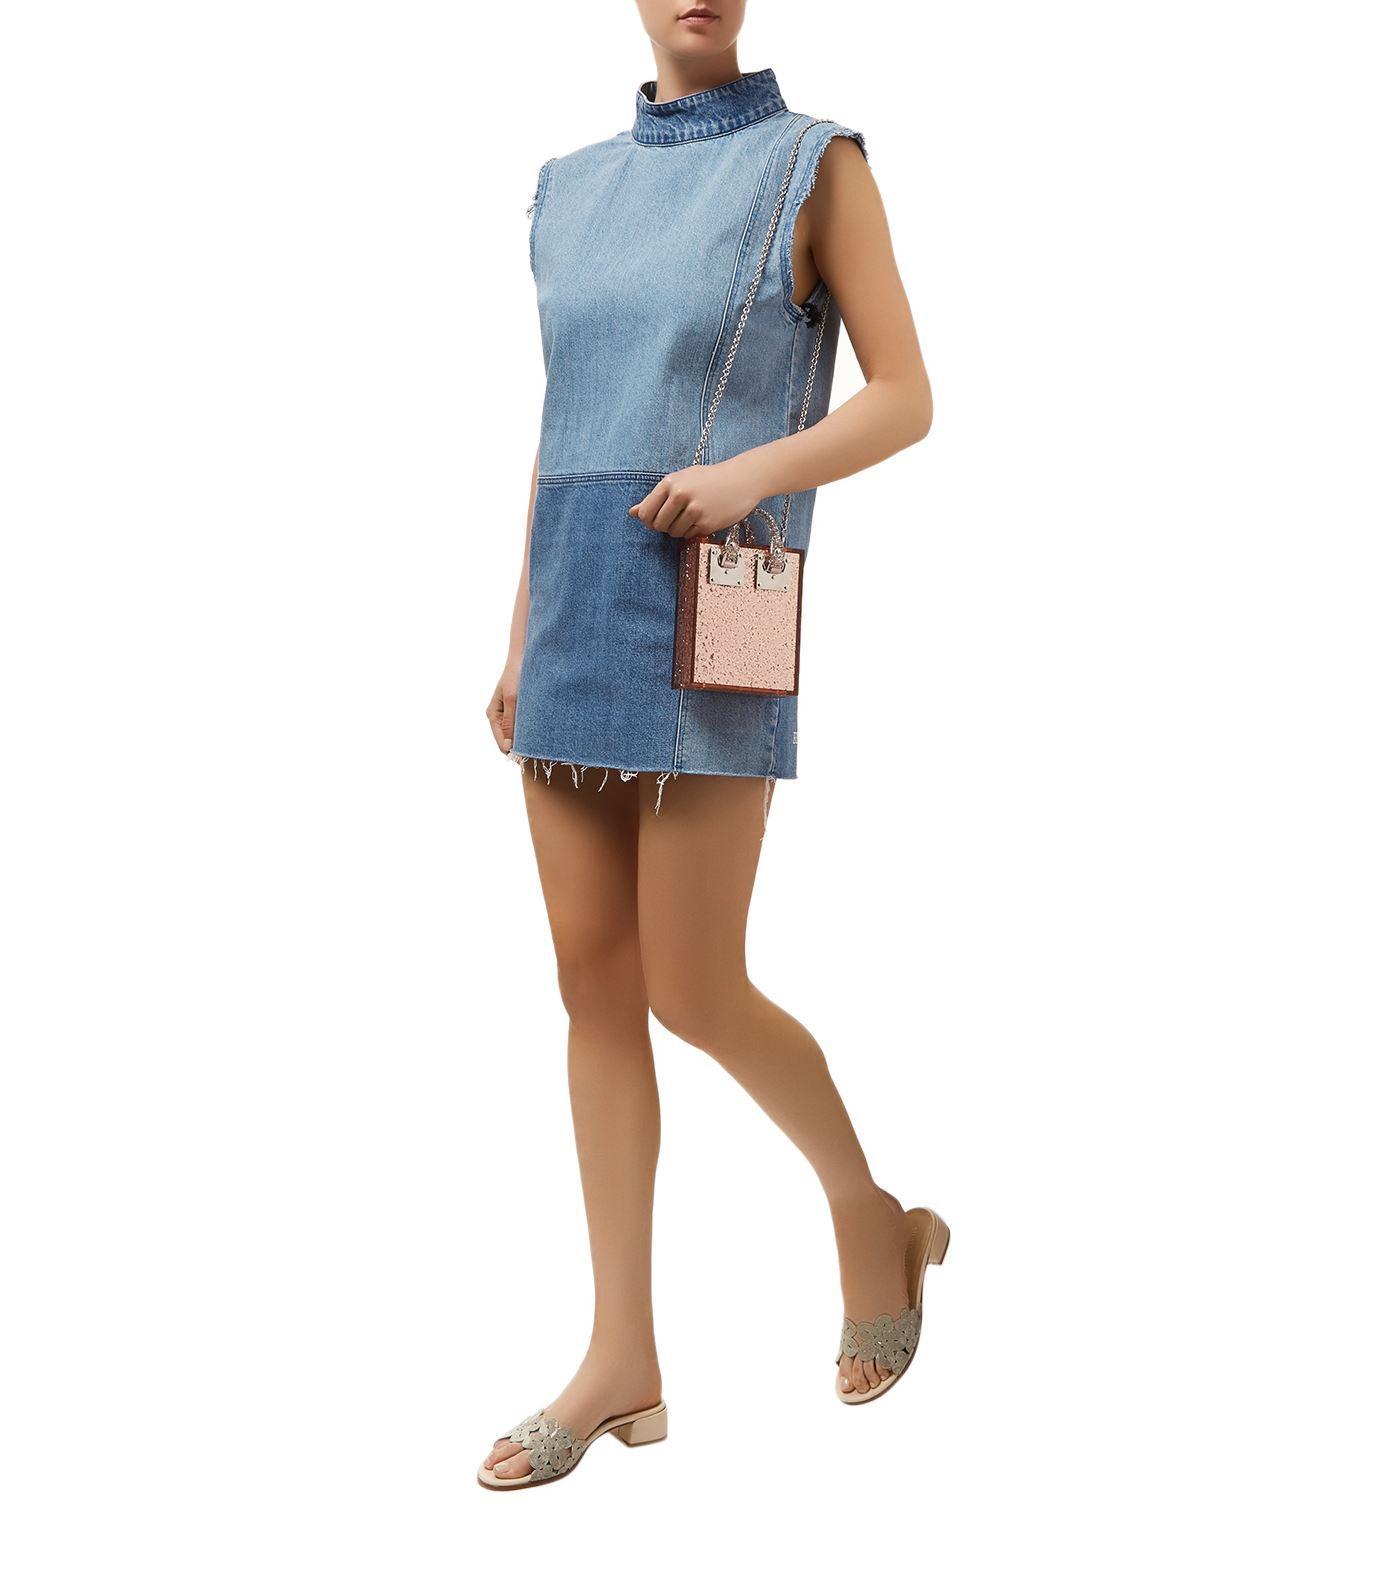 c140720b44 Ksubi Denim Patch Shift Dress in Blue - Lyst